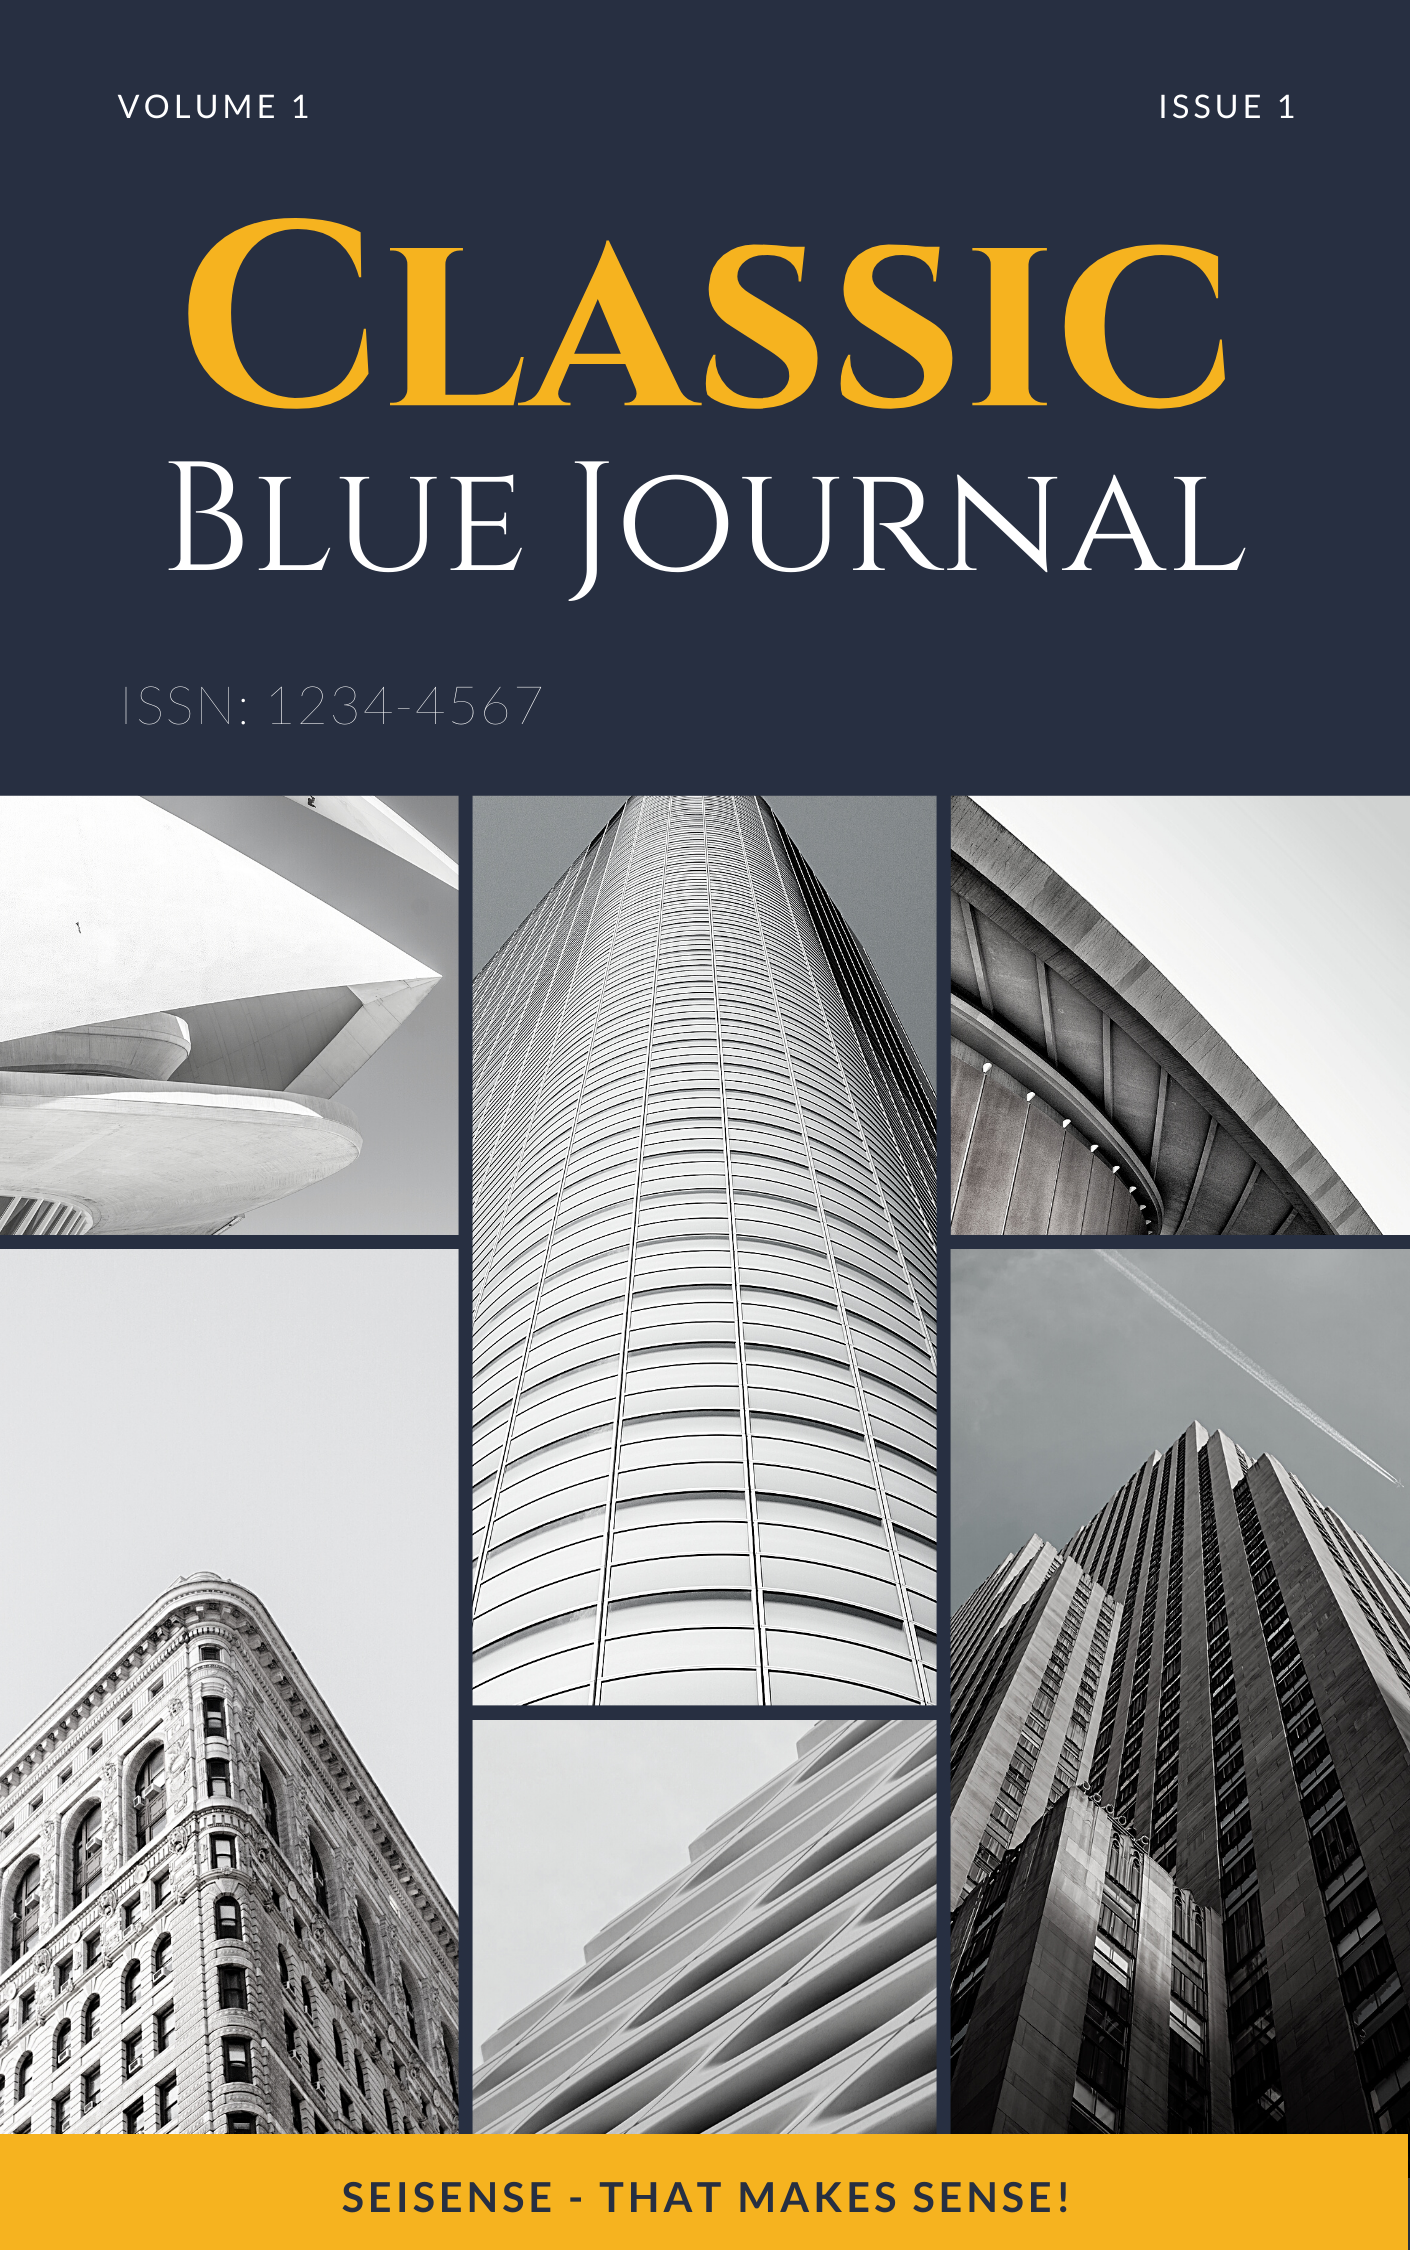 Classic Blue Journal